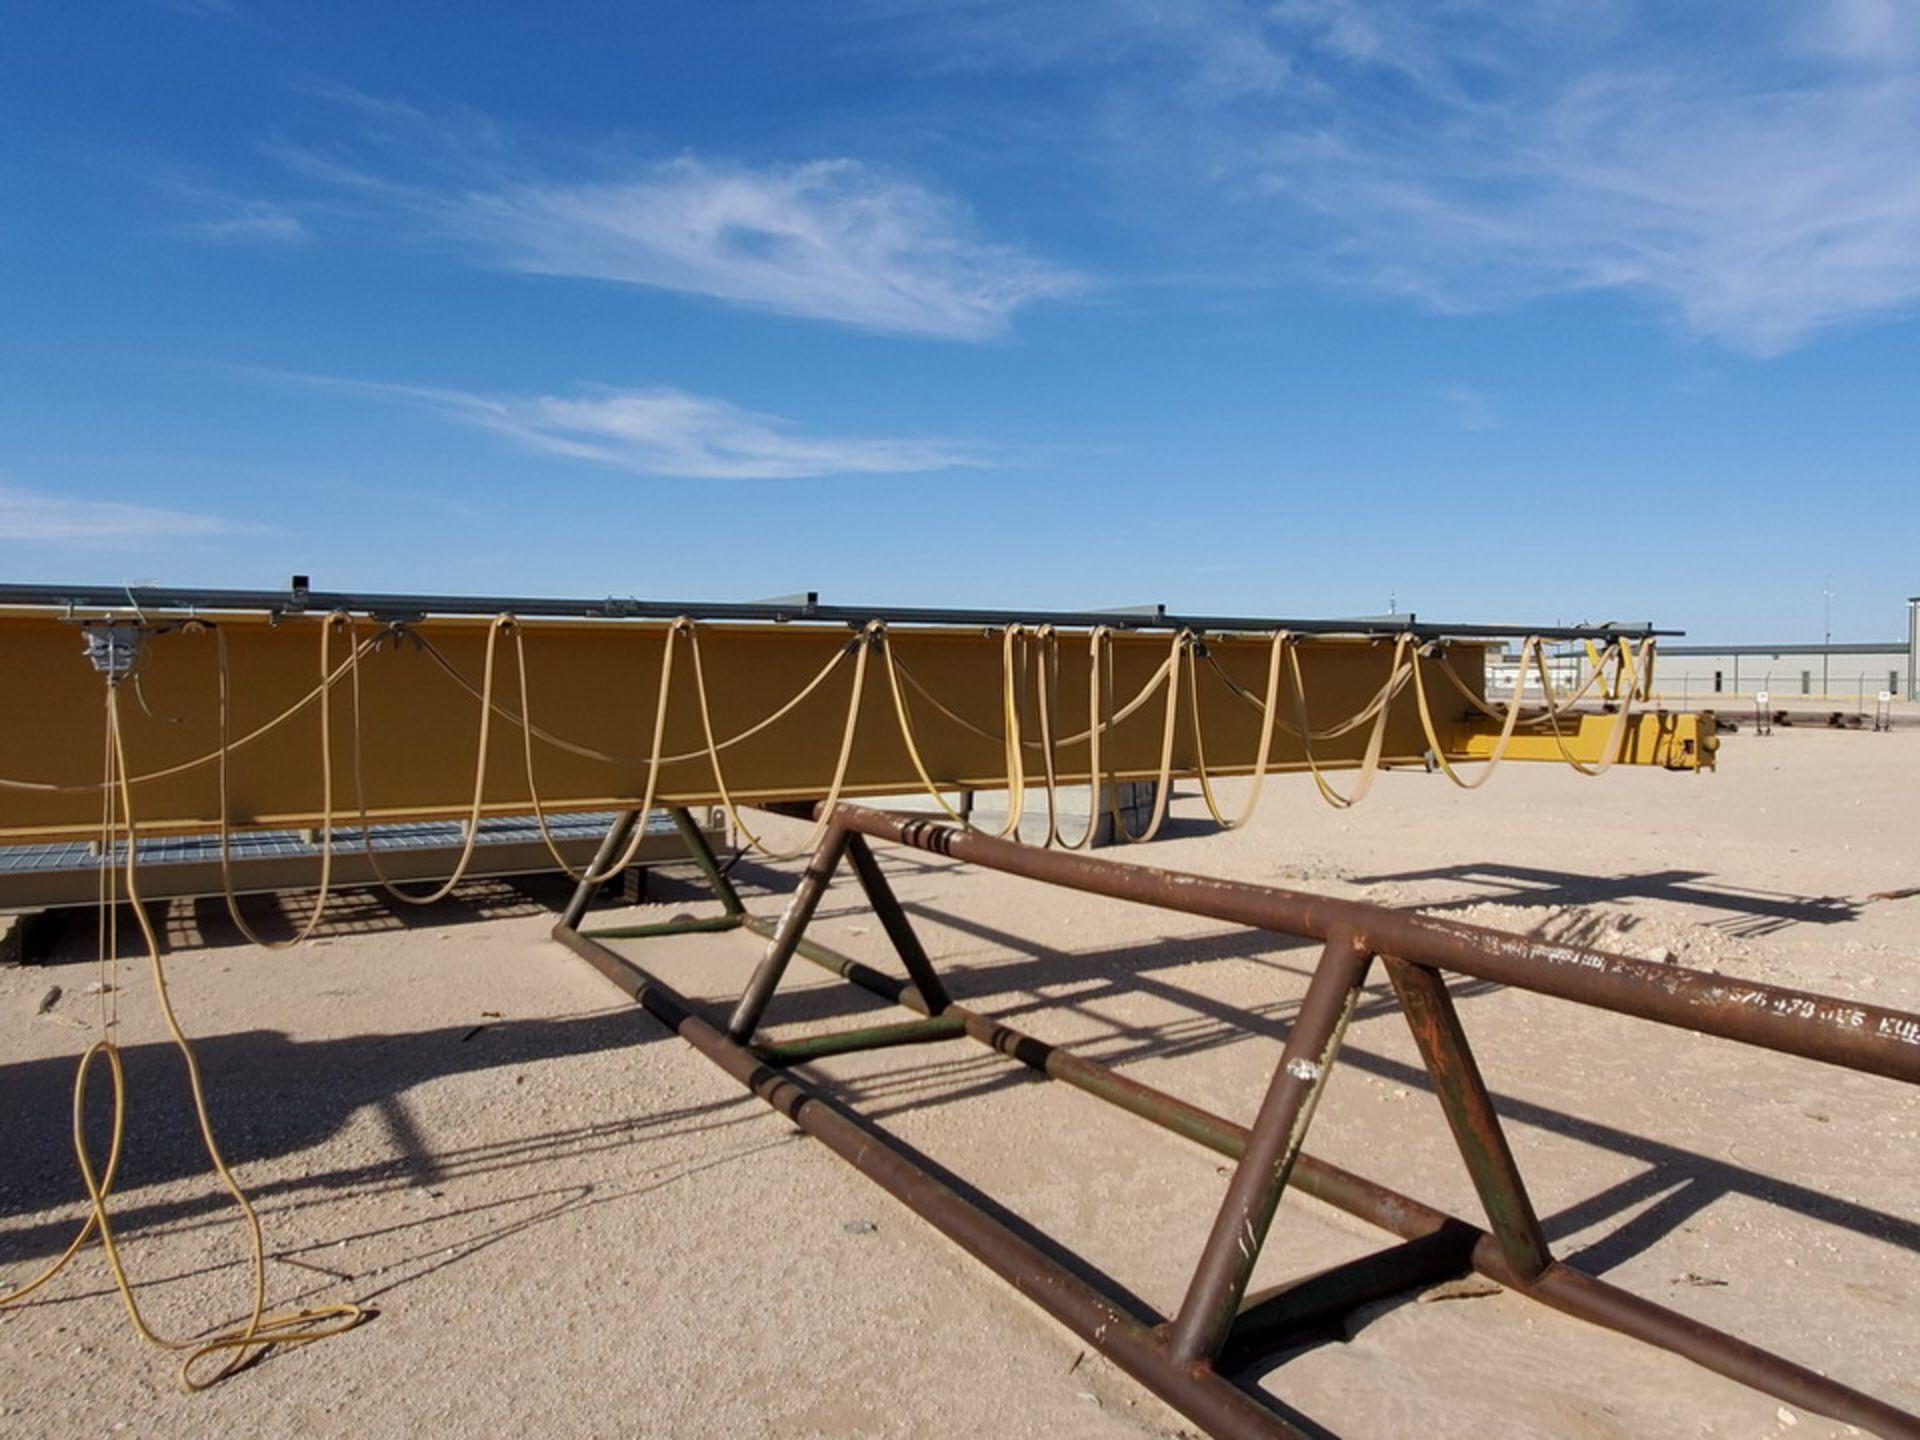 R & M 10 Ton Top Riding Bridge Crane Approx. 66' x 10'L - Image 30 of 39